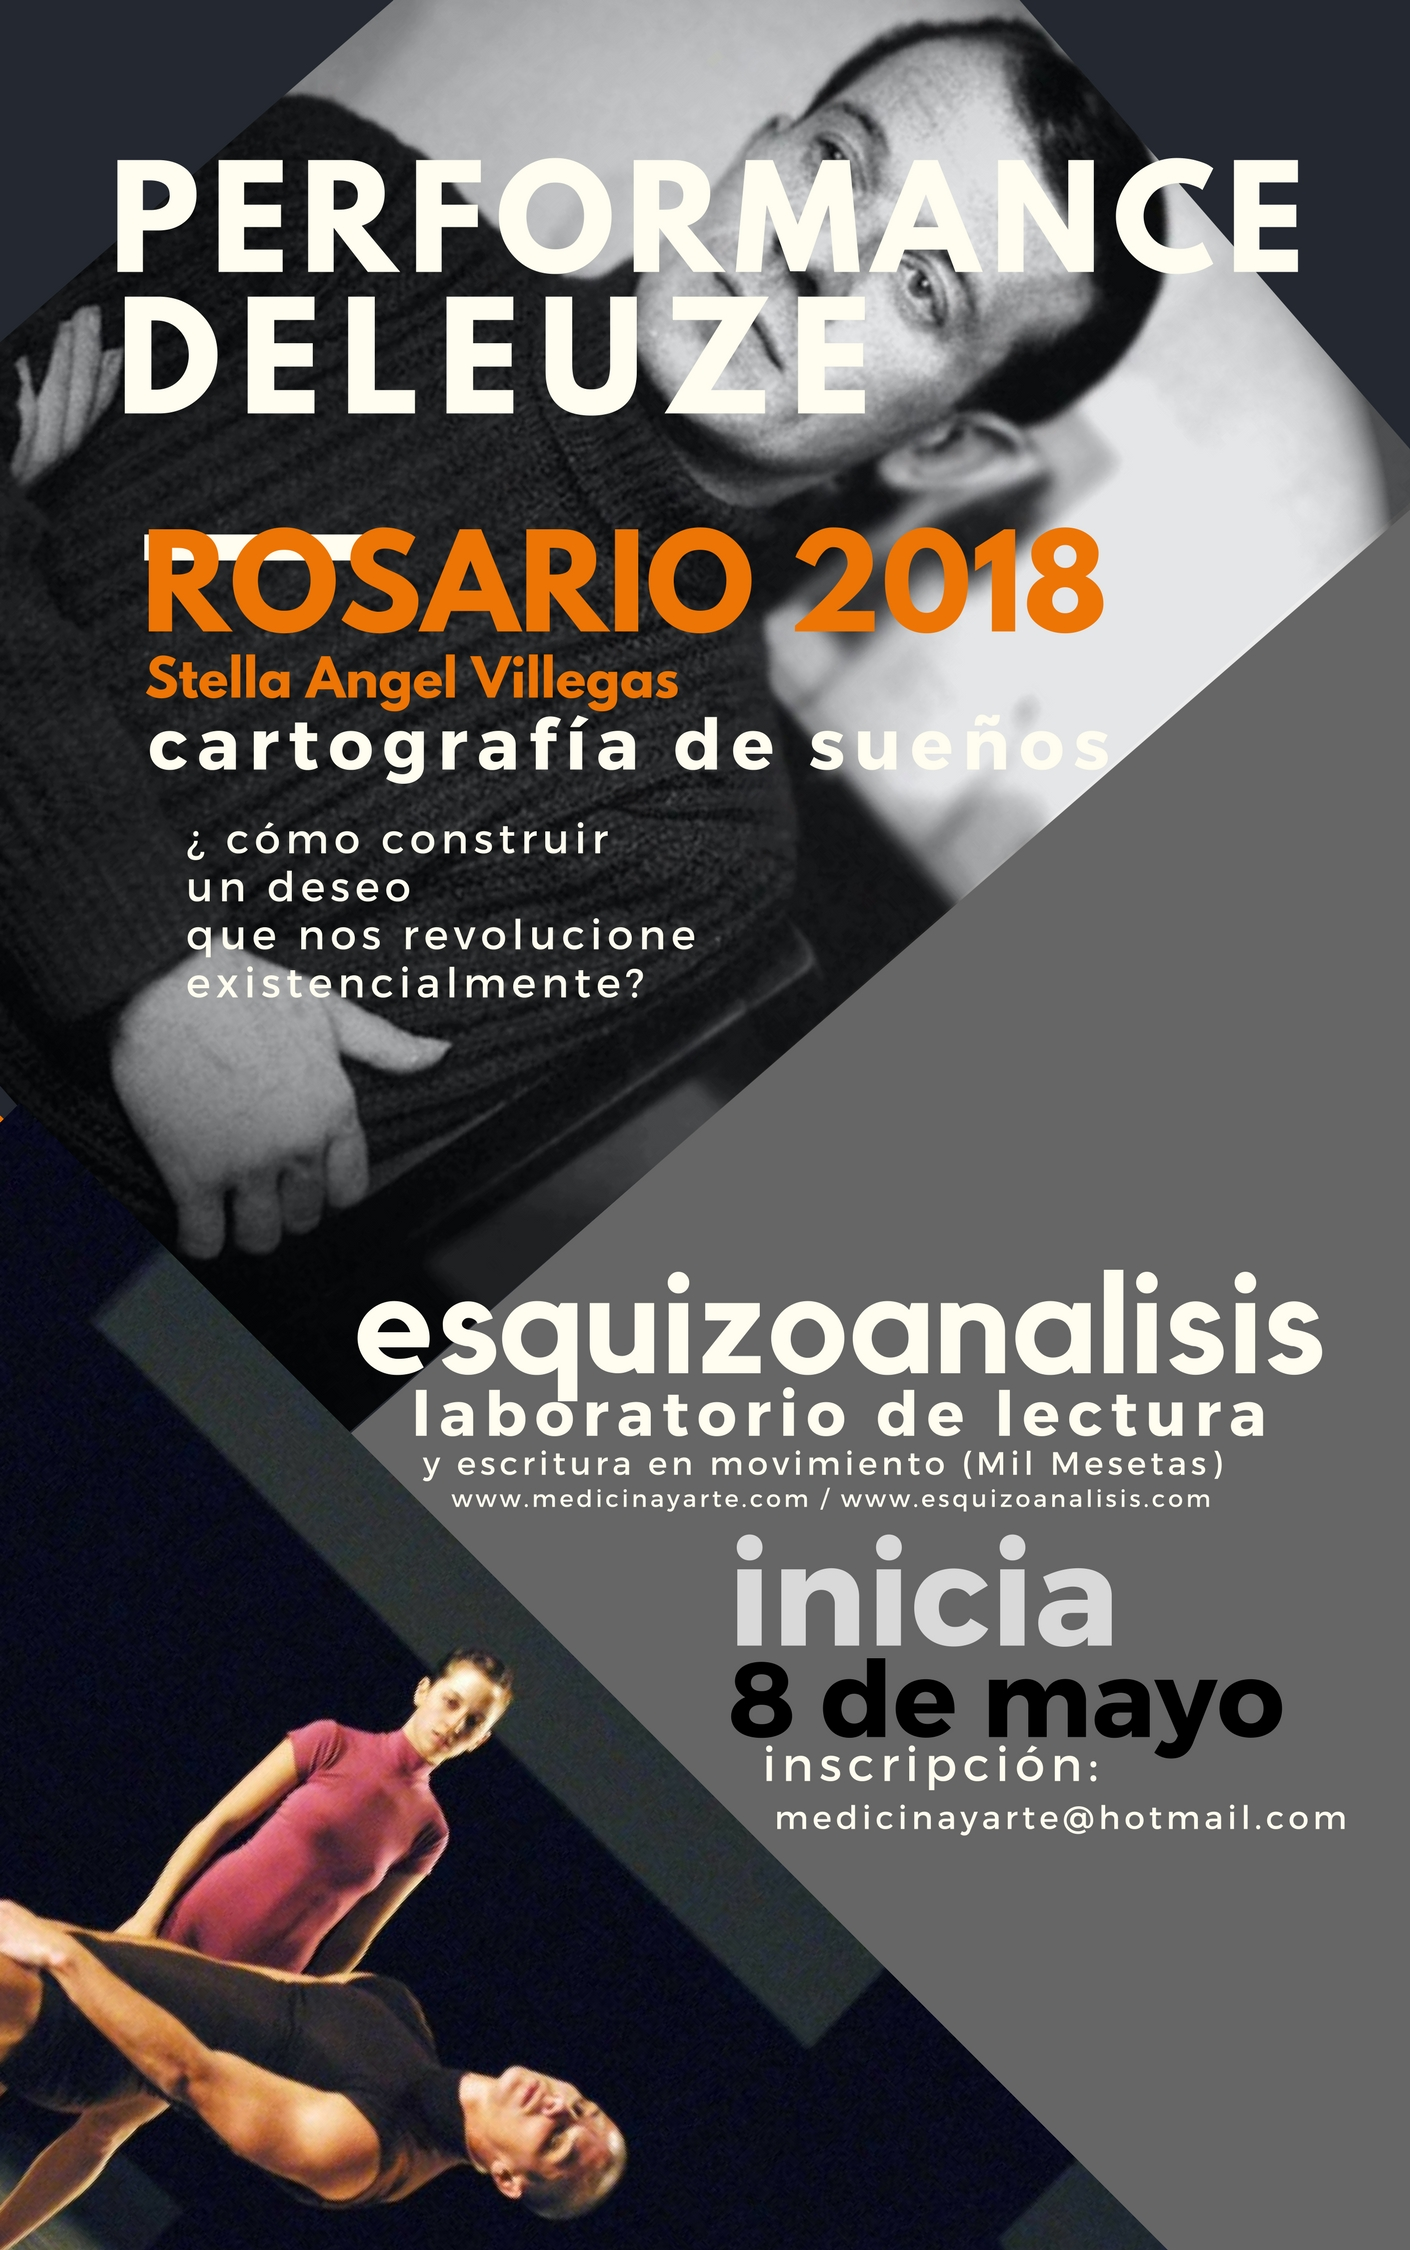 http://www.medicinayarte.com/img/PERFORMANCE-DELEUZE-ROSARIO-2018rosario_mayo.jpg